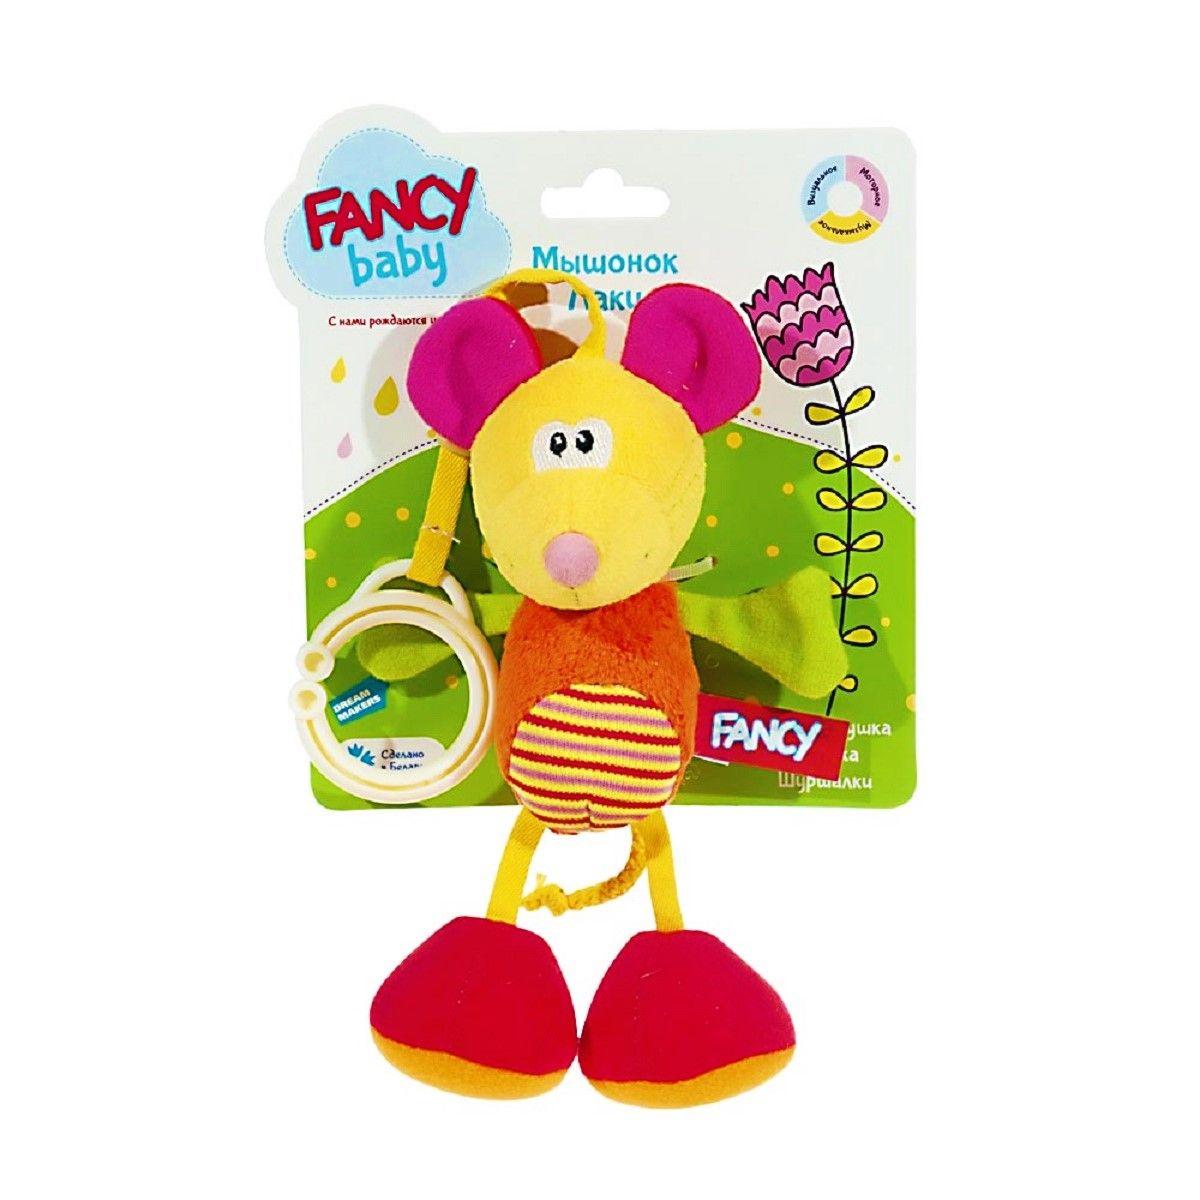 Fancy Развивающая игрушка Мышонок ЛакиMISH0Игрушка-подвеска с элементами: погремушка, пищалка, шуршащие ушки.